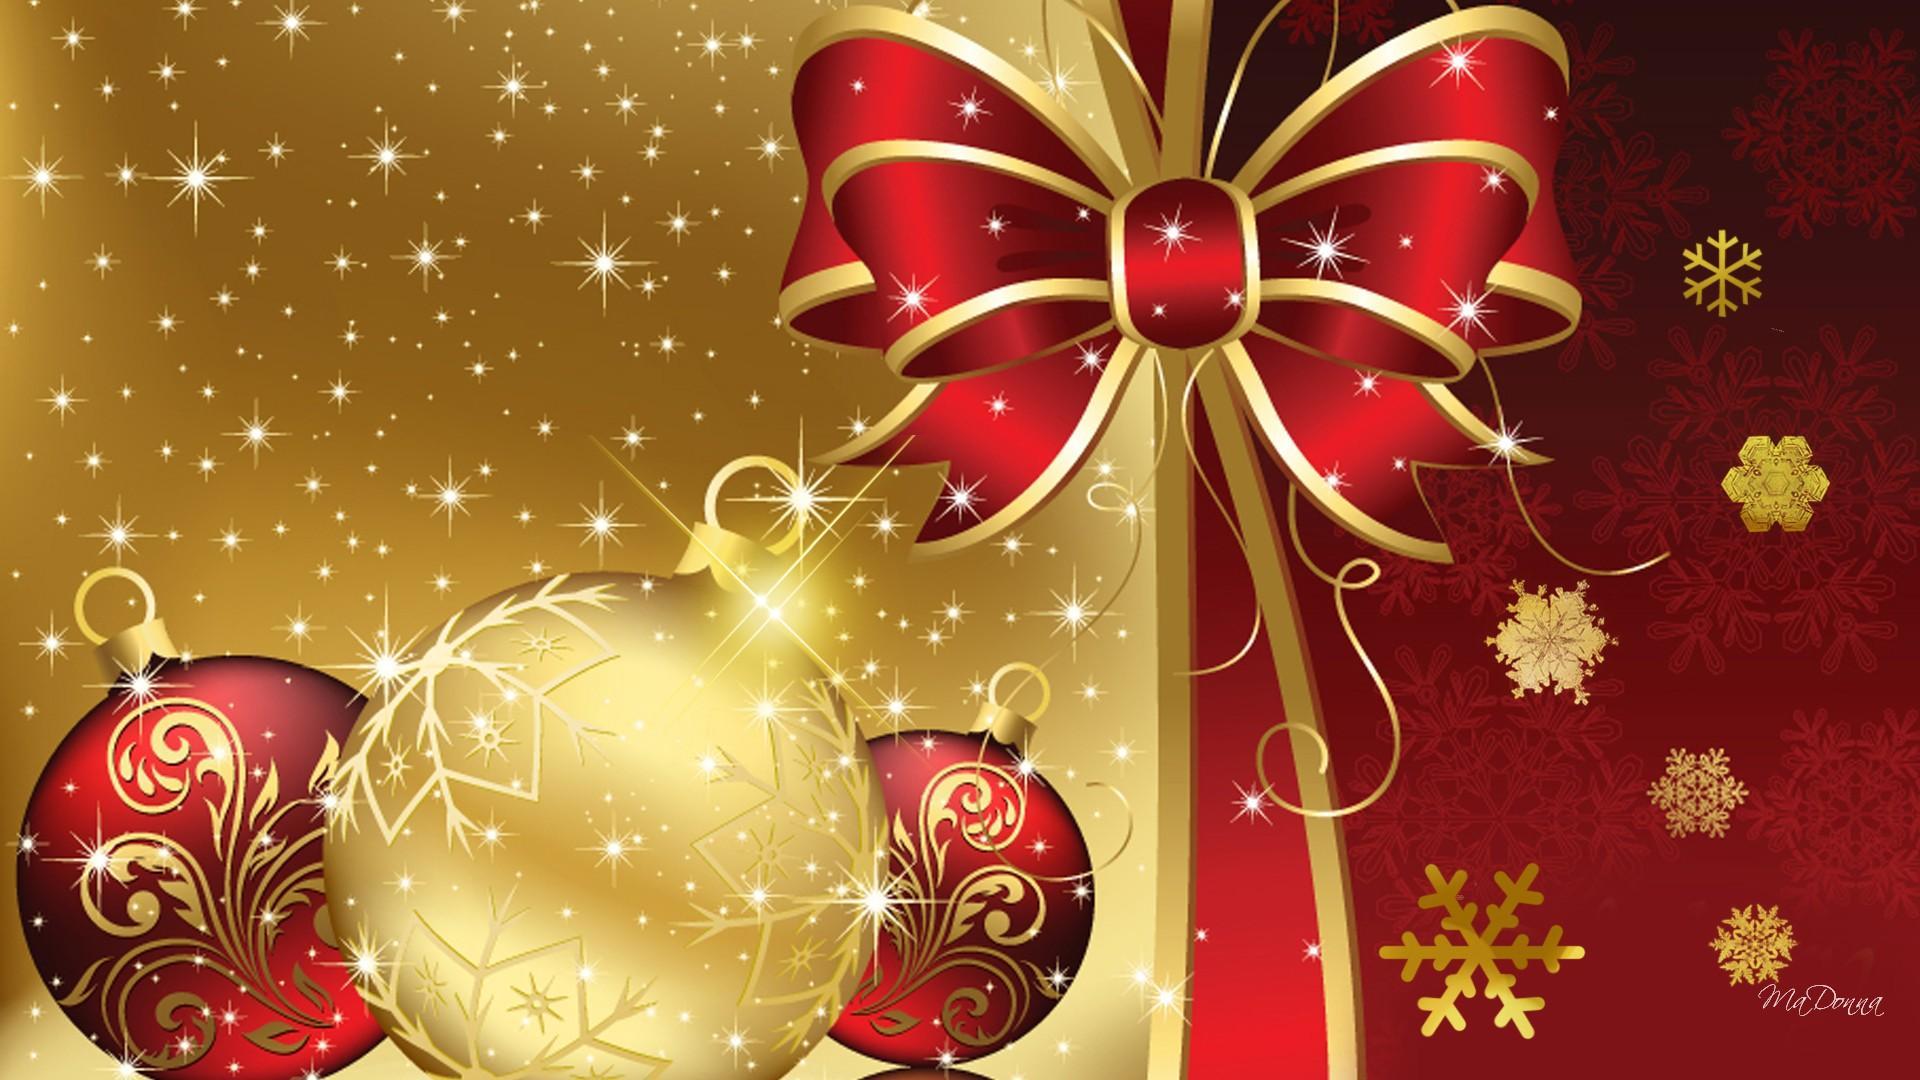 Merry Christmas HD Wallpaper   Clip Art Library 1920x1080